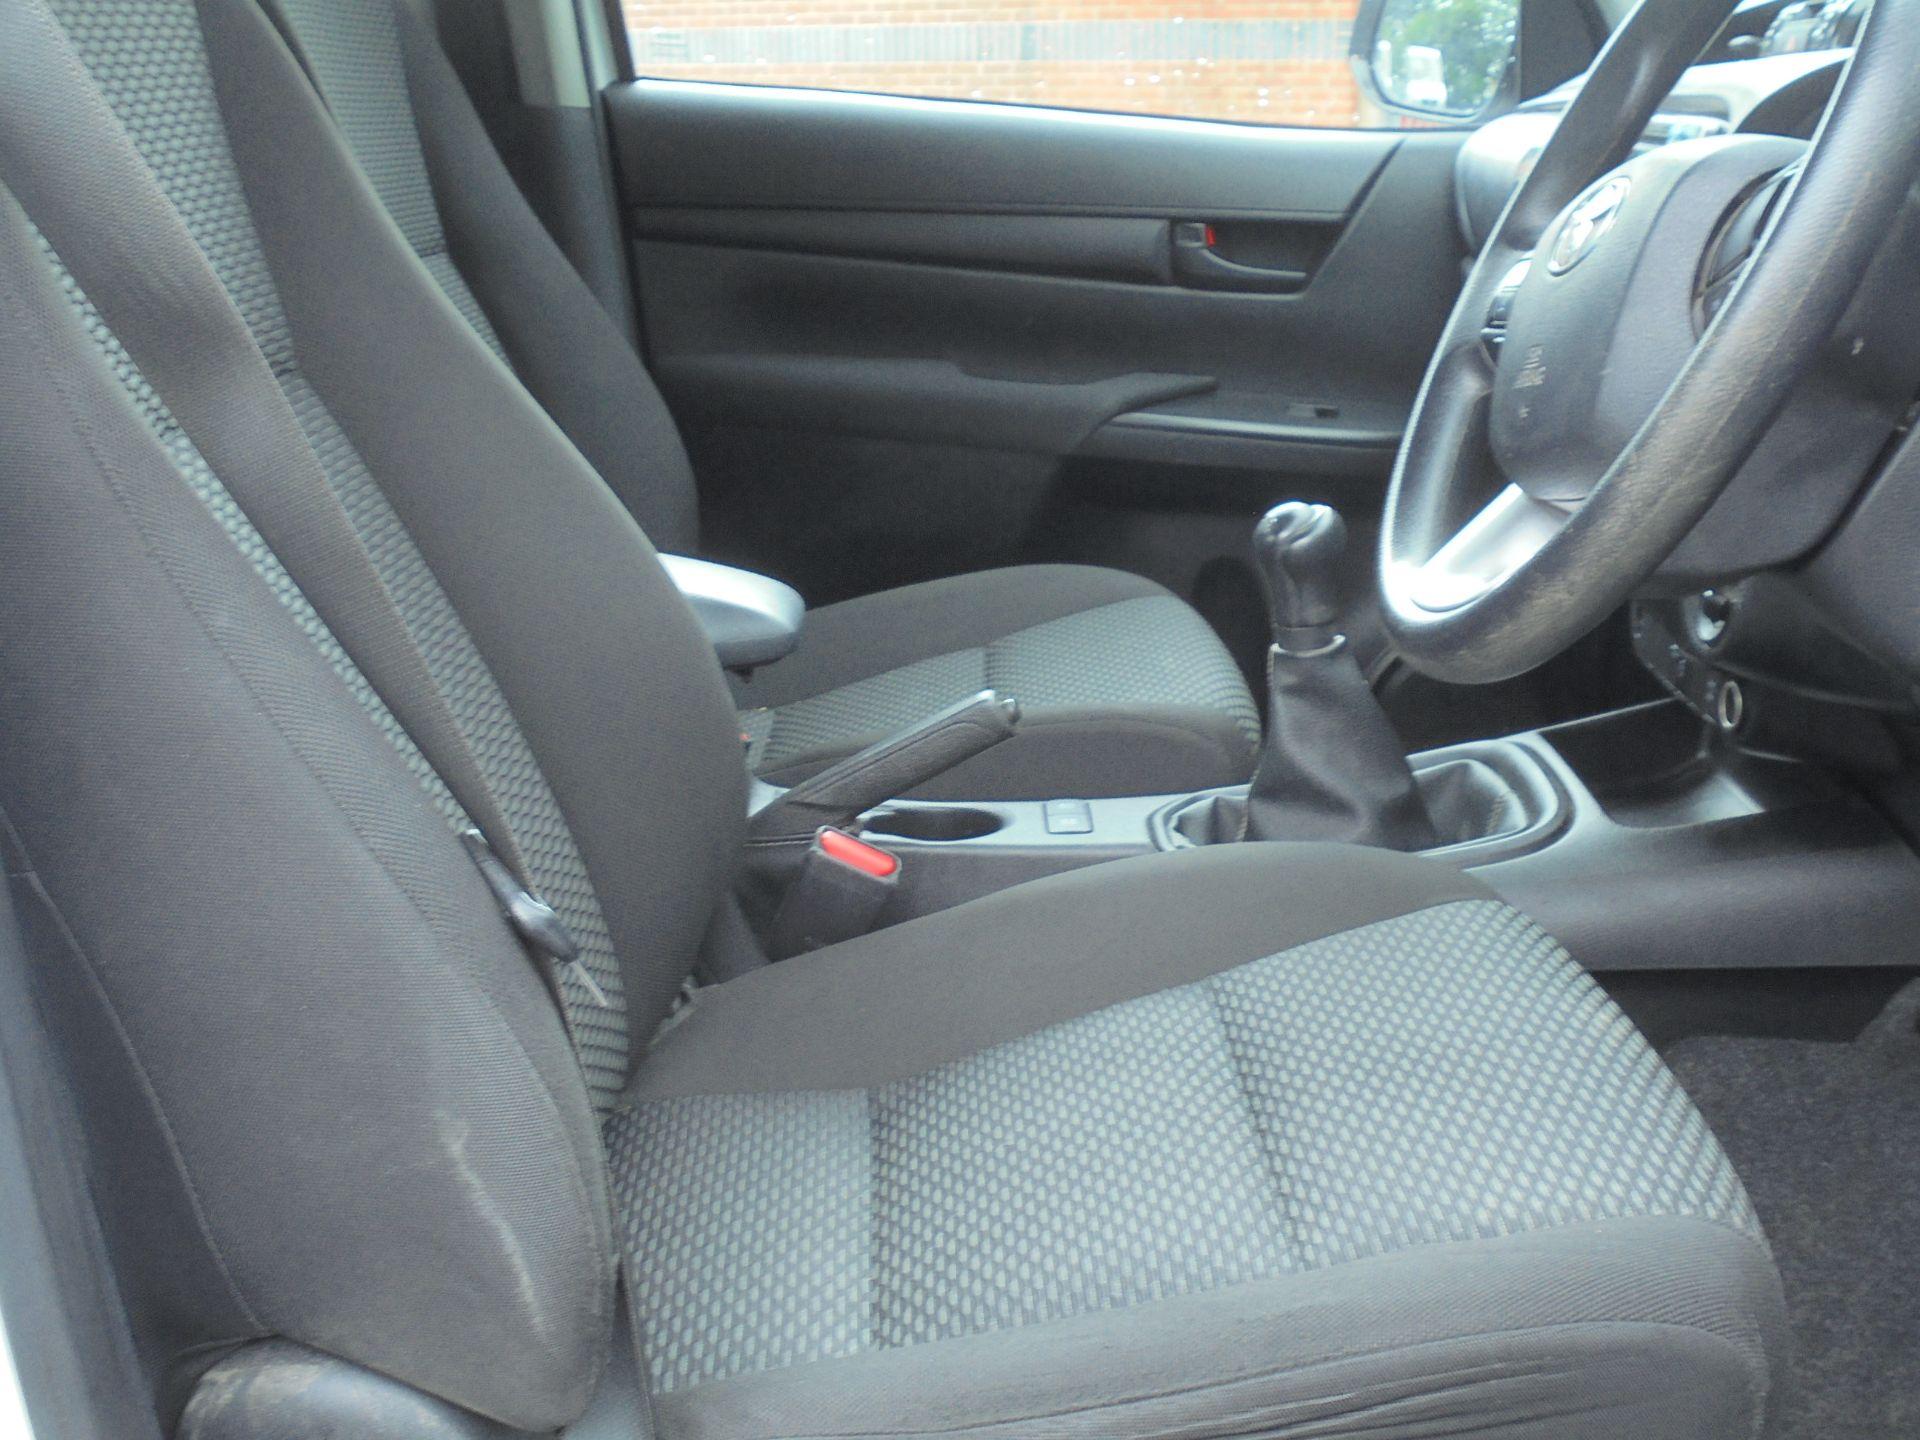 2018 Toyota Hilux Active D/Cab Pick Up 2.5 D-4D 4Wd 144 (NV18NTC) Image 12